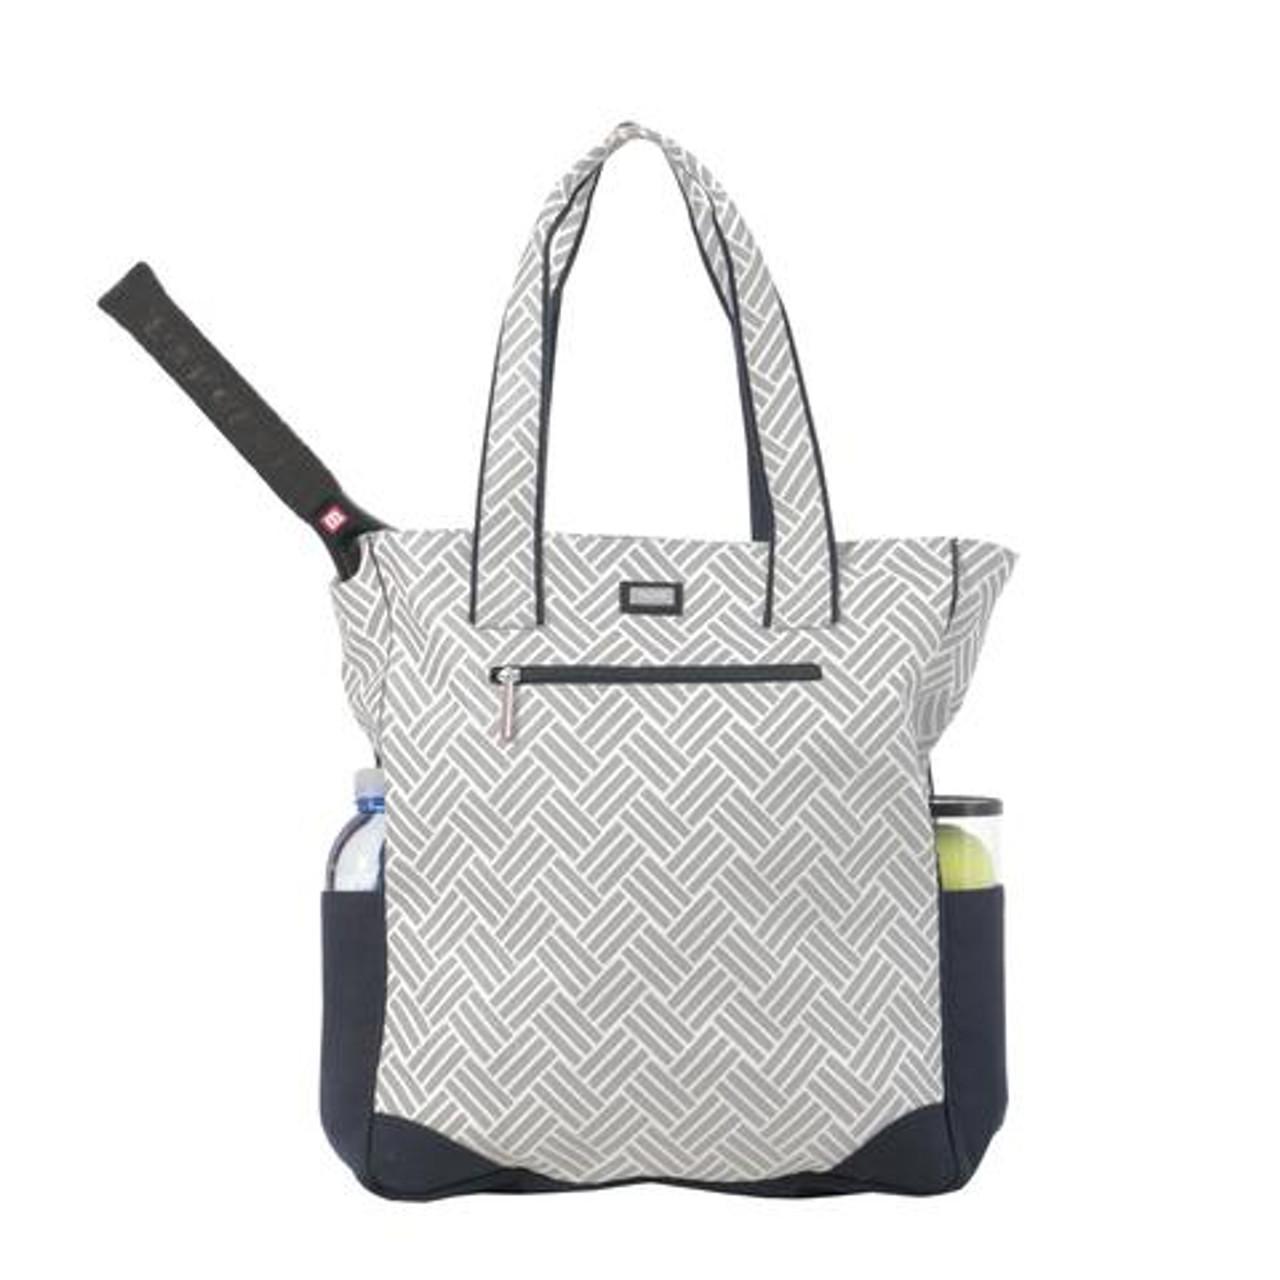 Ame Lulu Taj Tennis Tote Bag